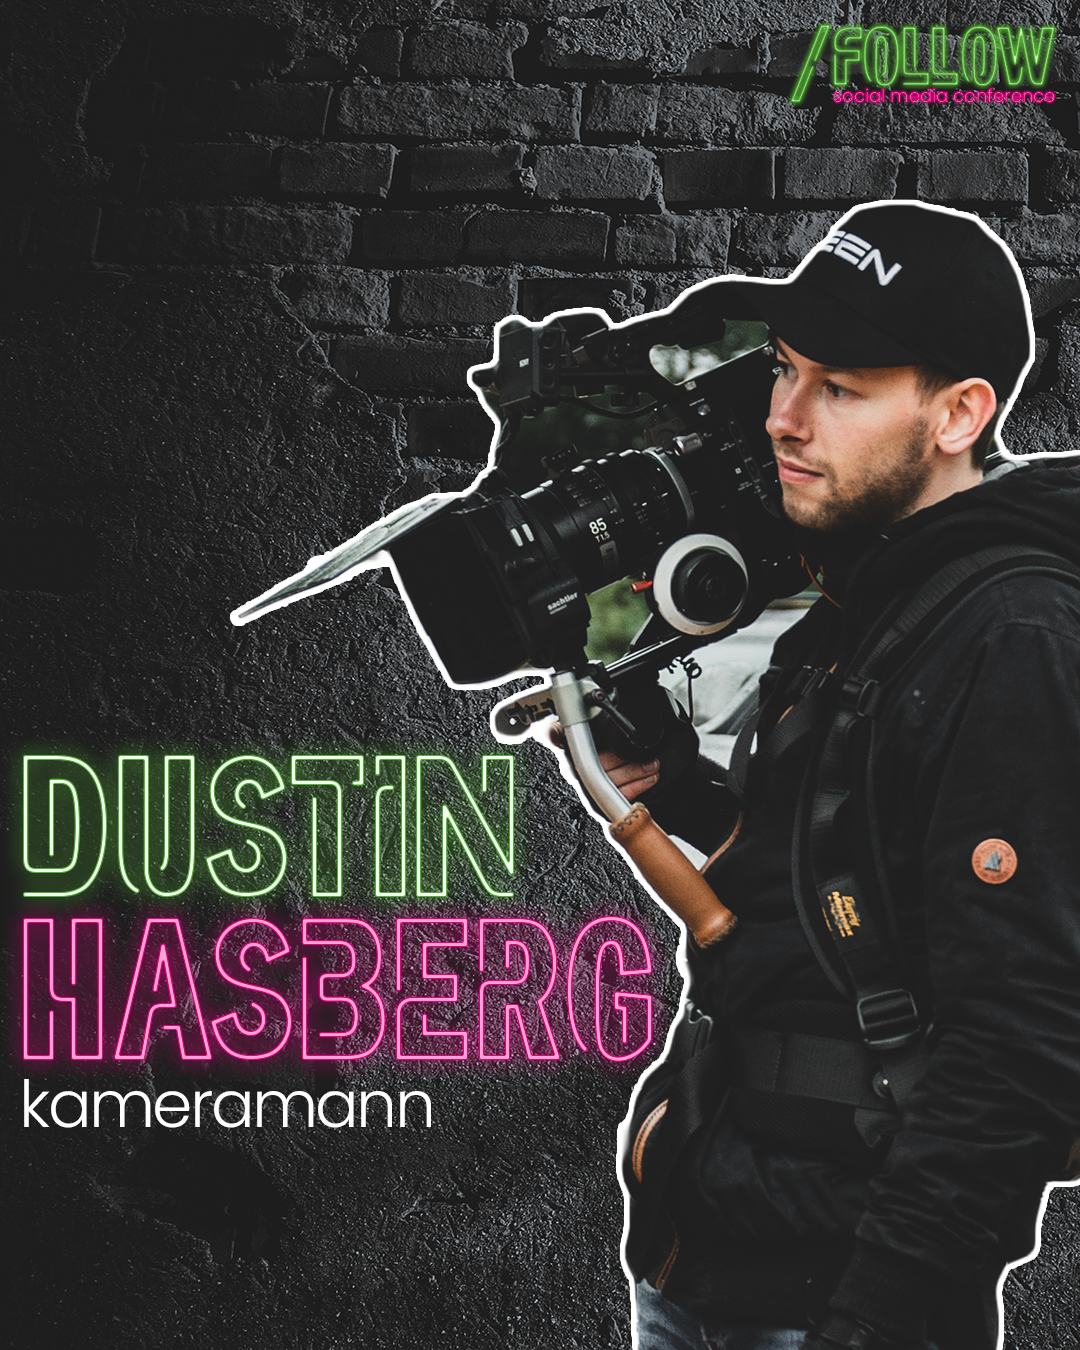 Dustin Hasberg